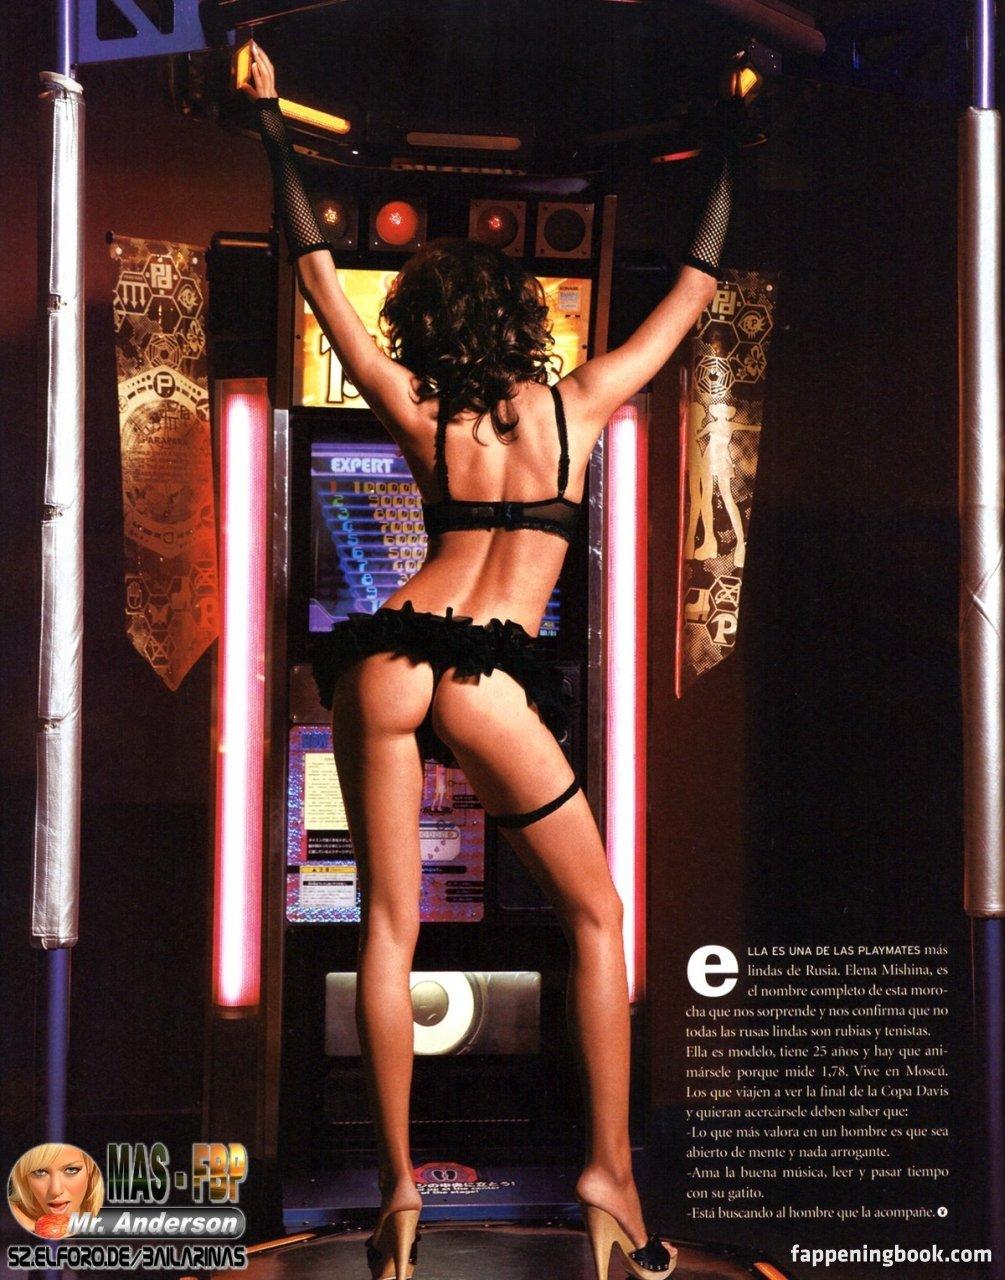 Darlene nackt Demko Sexiest Pictures